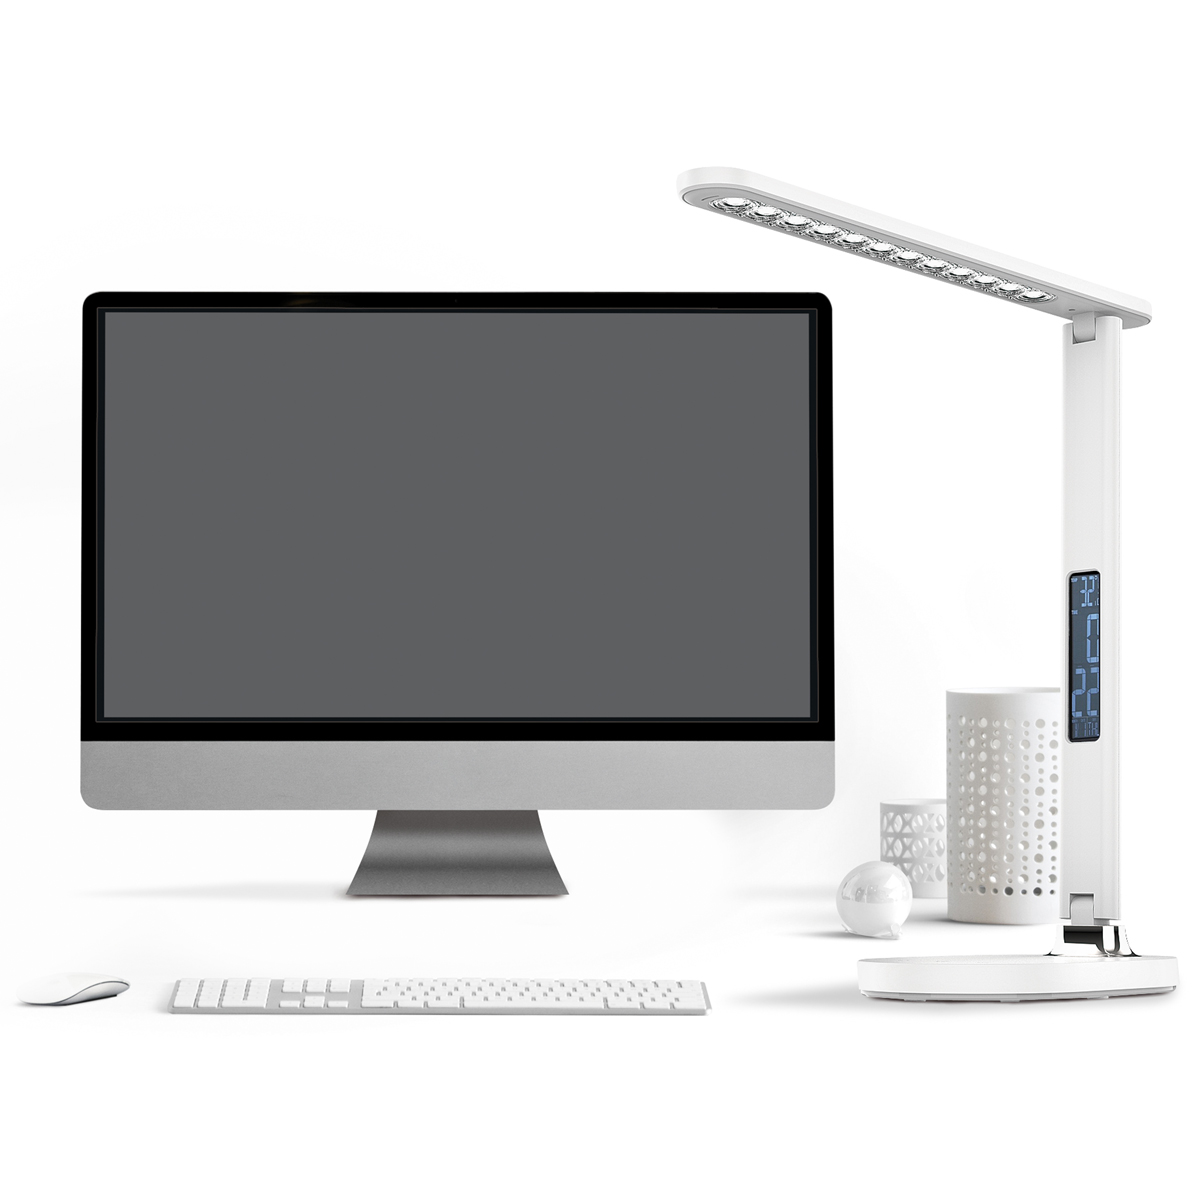 Platinet bureaulamp met alarmklok (met snooze functie) / kalender wit, LED 4000K, 700lm